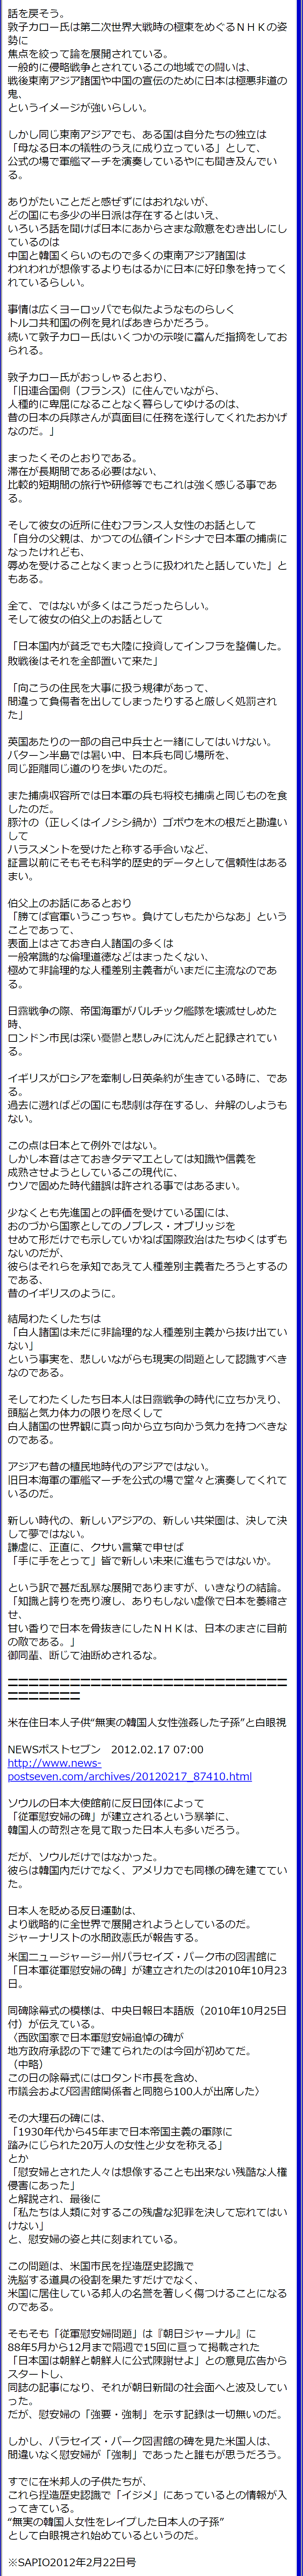 NHKが関与した恐るべき「黙示録」2_1